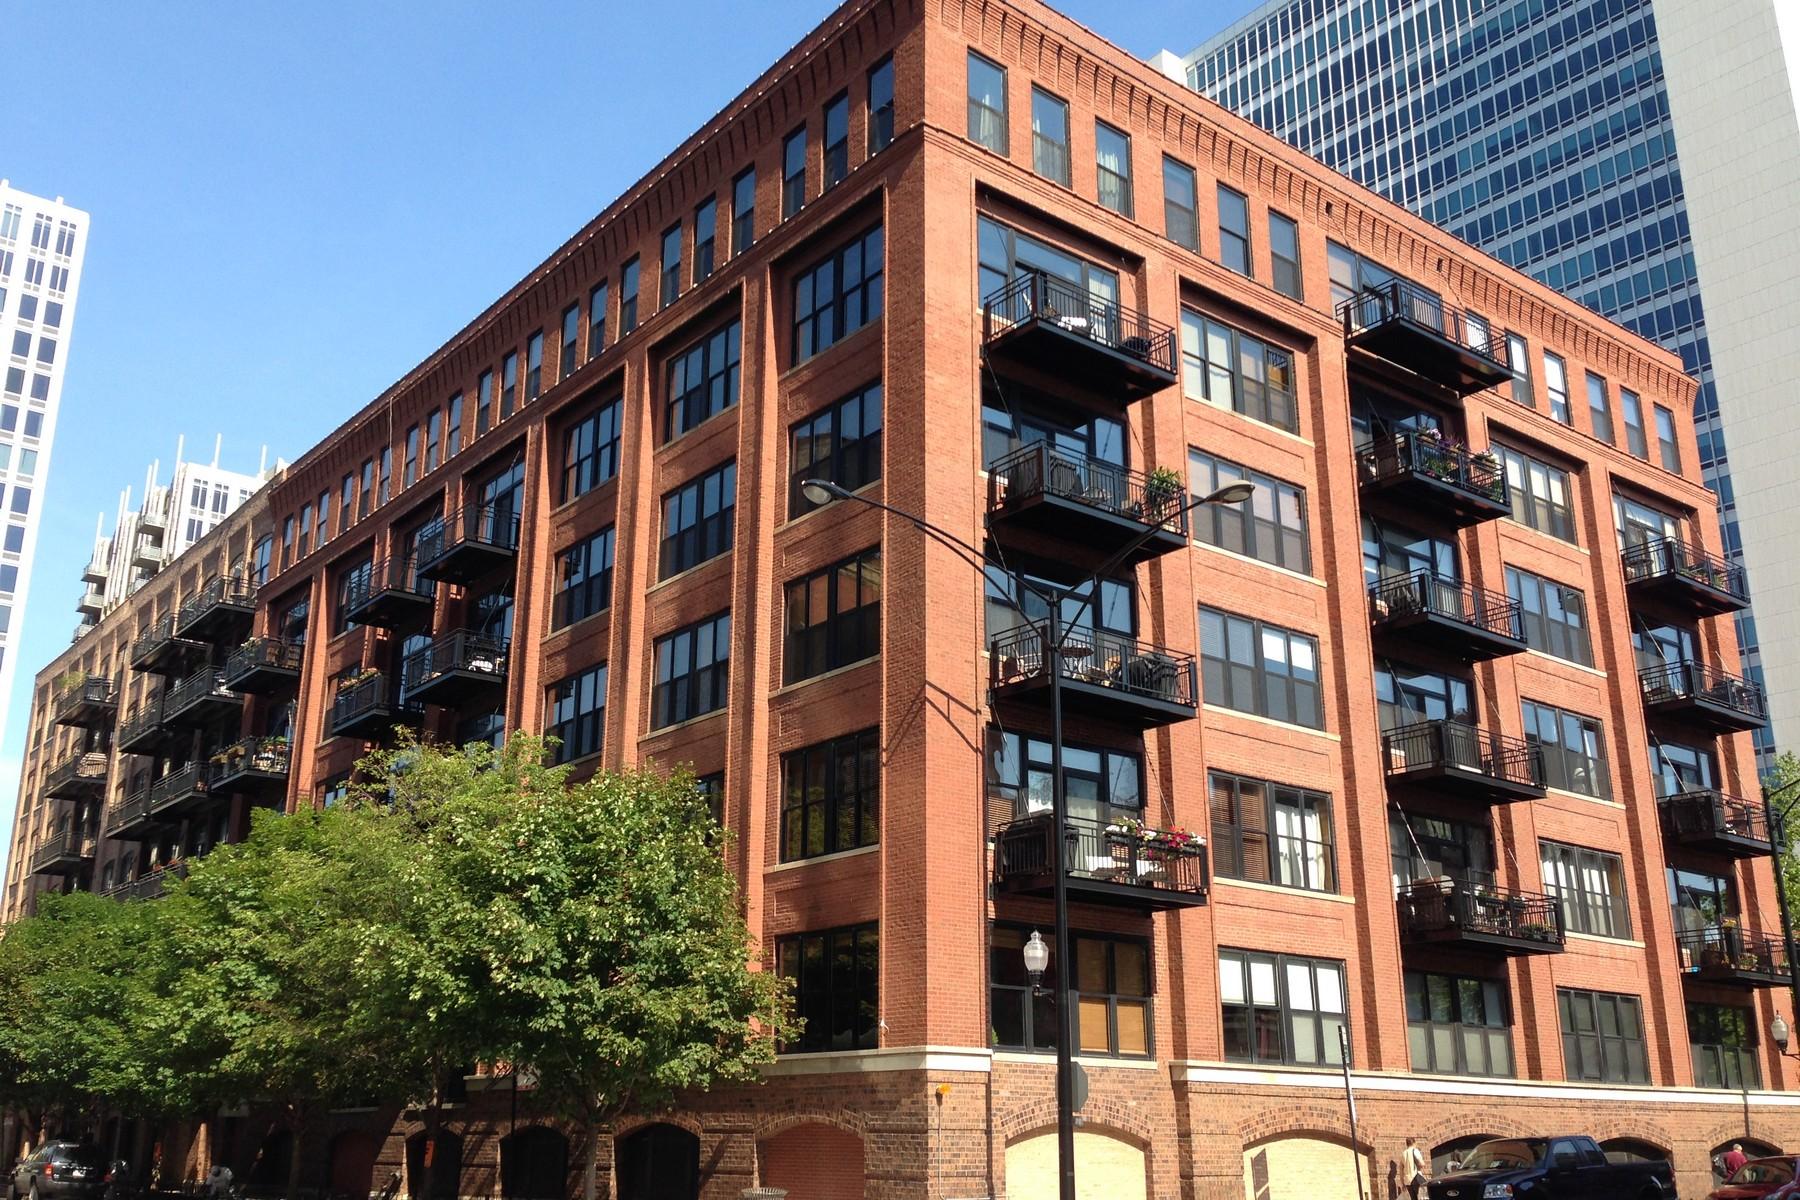 共管式独立产权公寓 为 销售 在 Beautiful and Bright River North Loft! 520 W Huron Street Unit 218 Near North Side, 芝加哥, 伊利诺斯州, 60654 美国